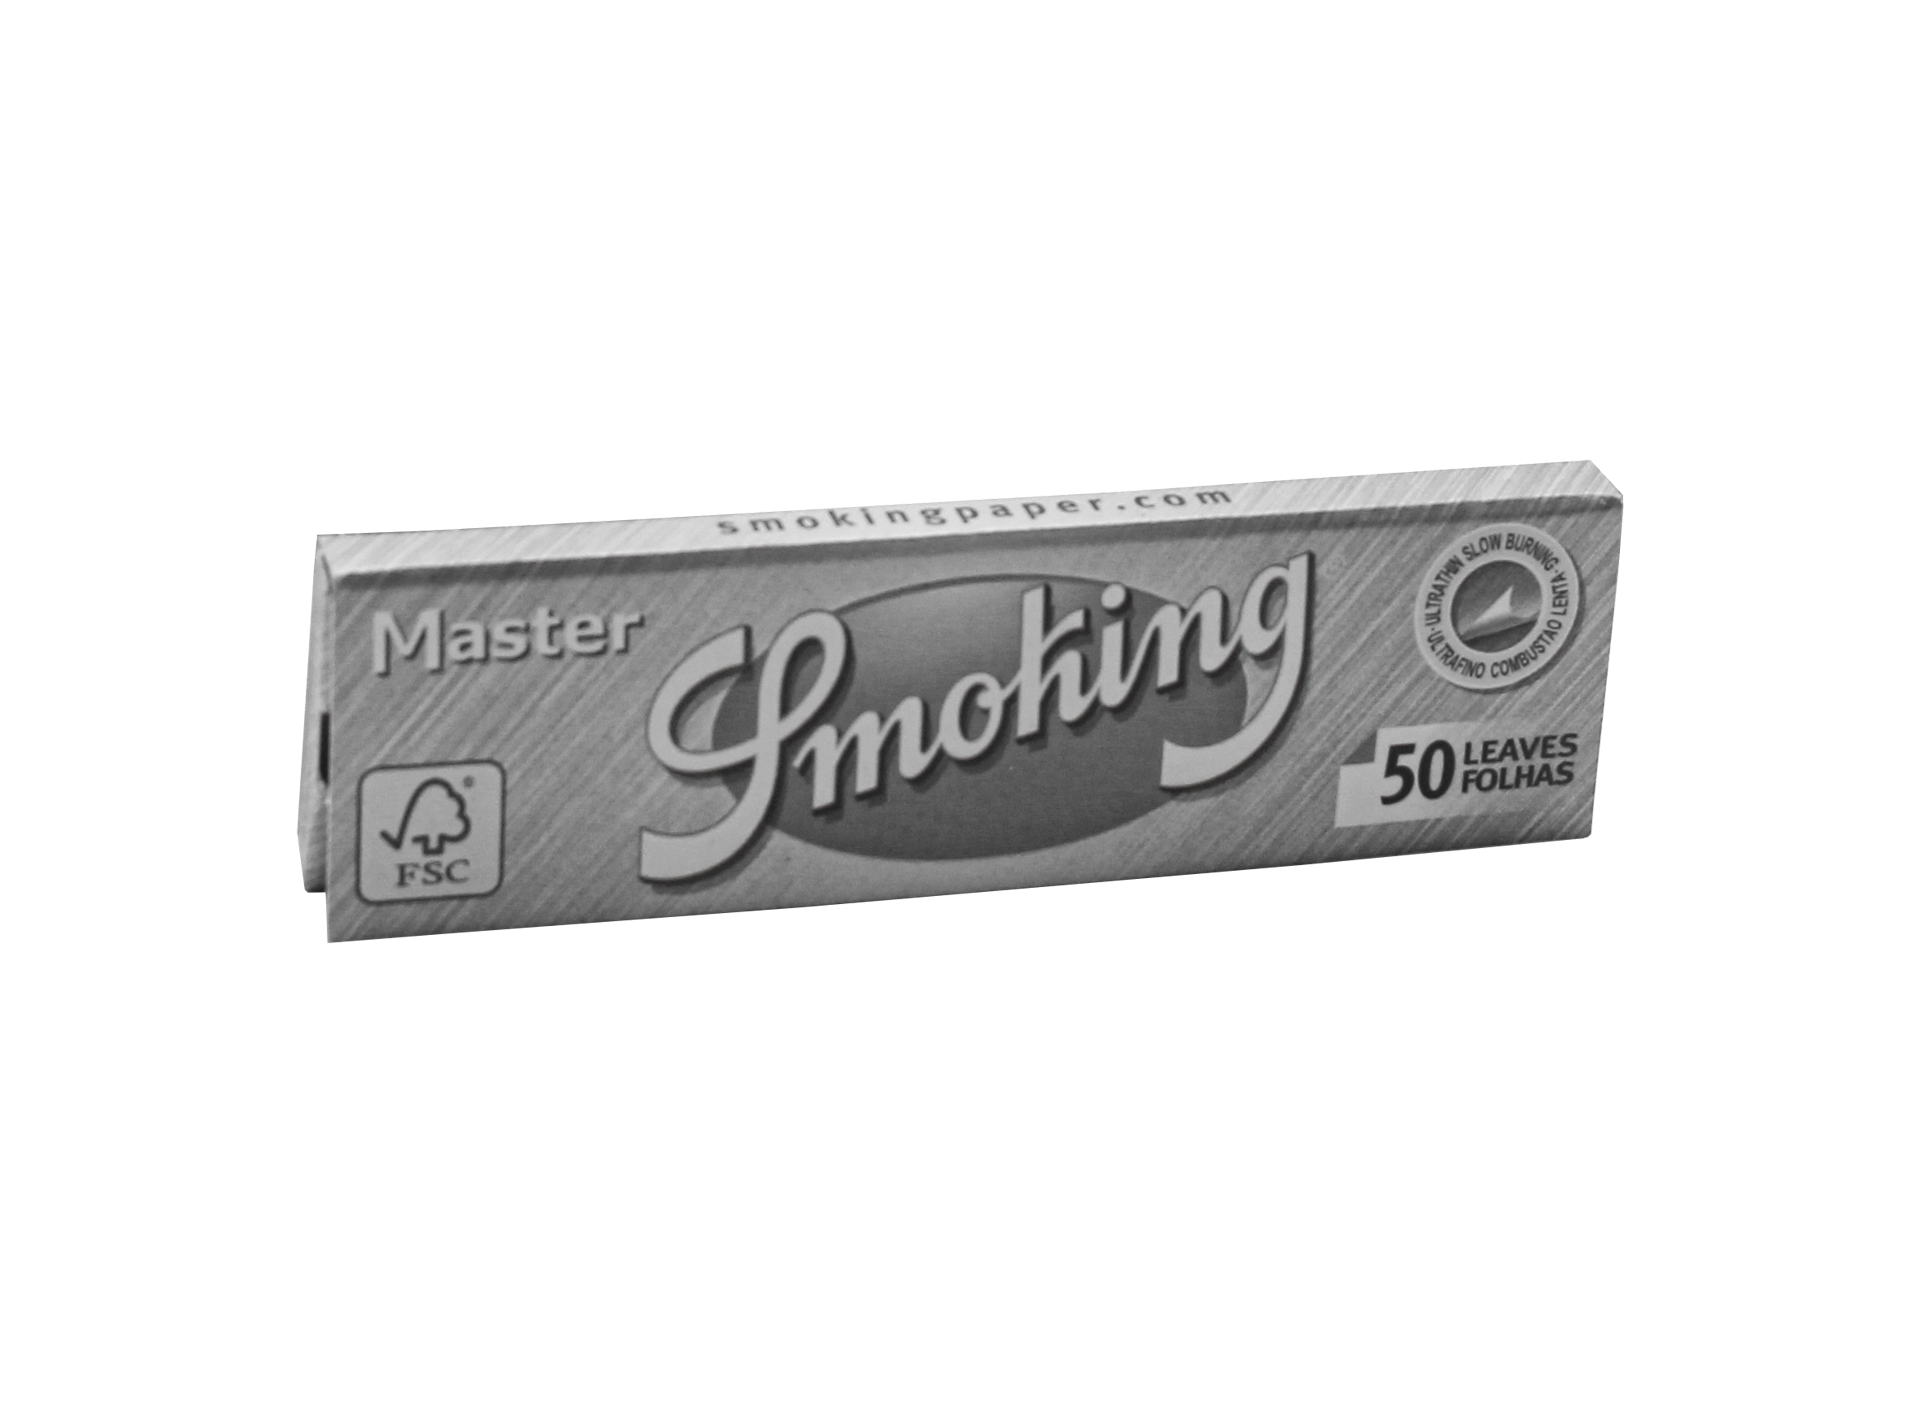 SEDA SMOKING MASTER 1-1/4 (Un.)